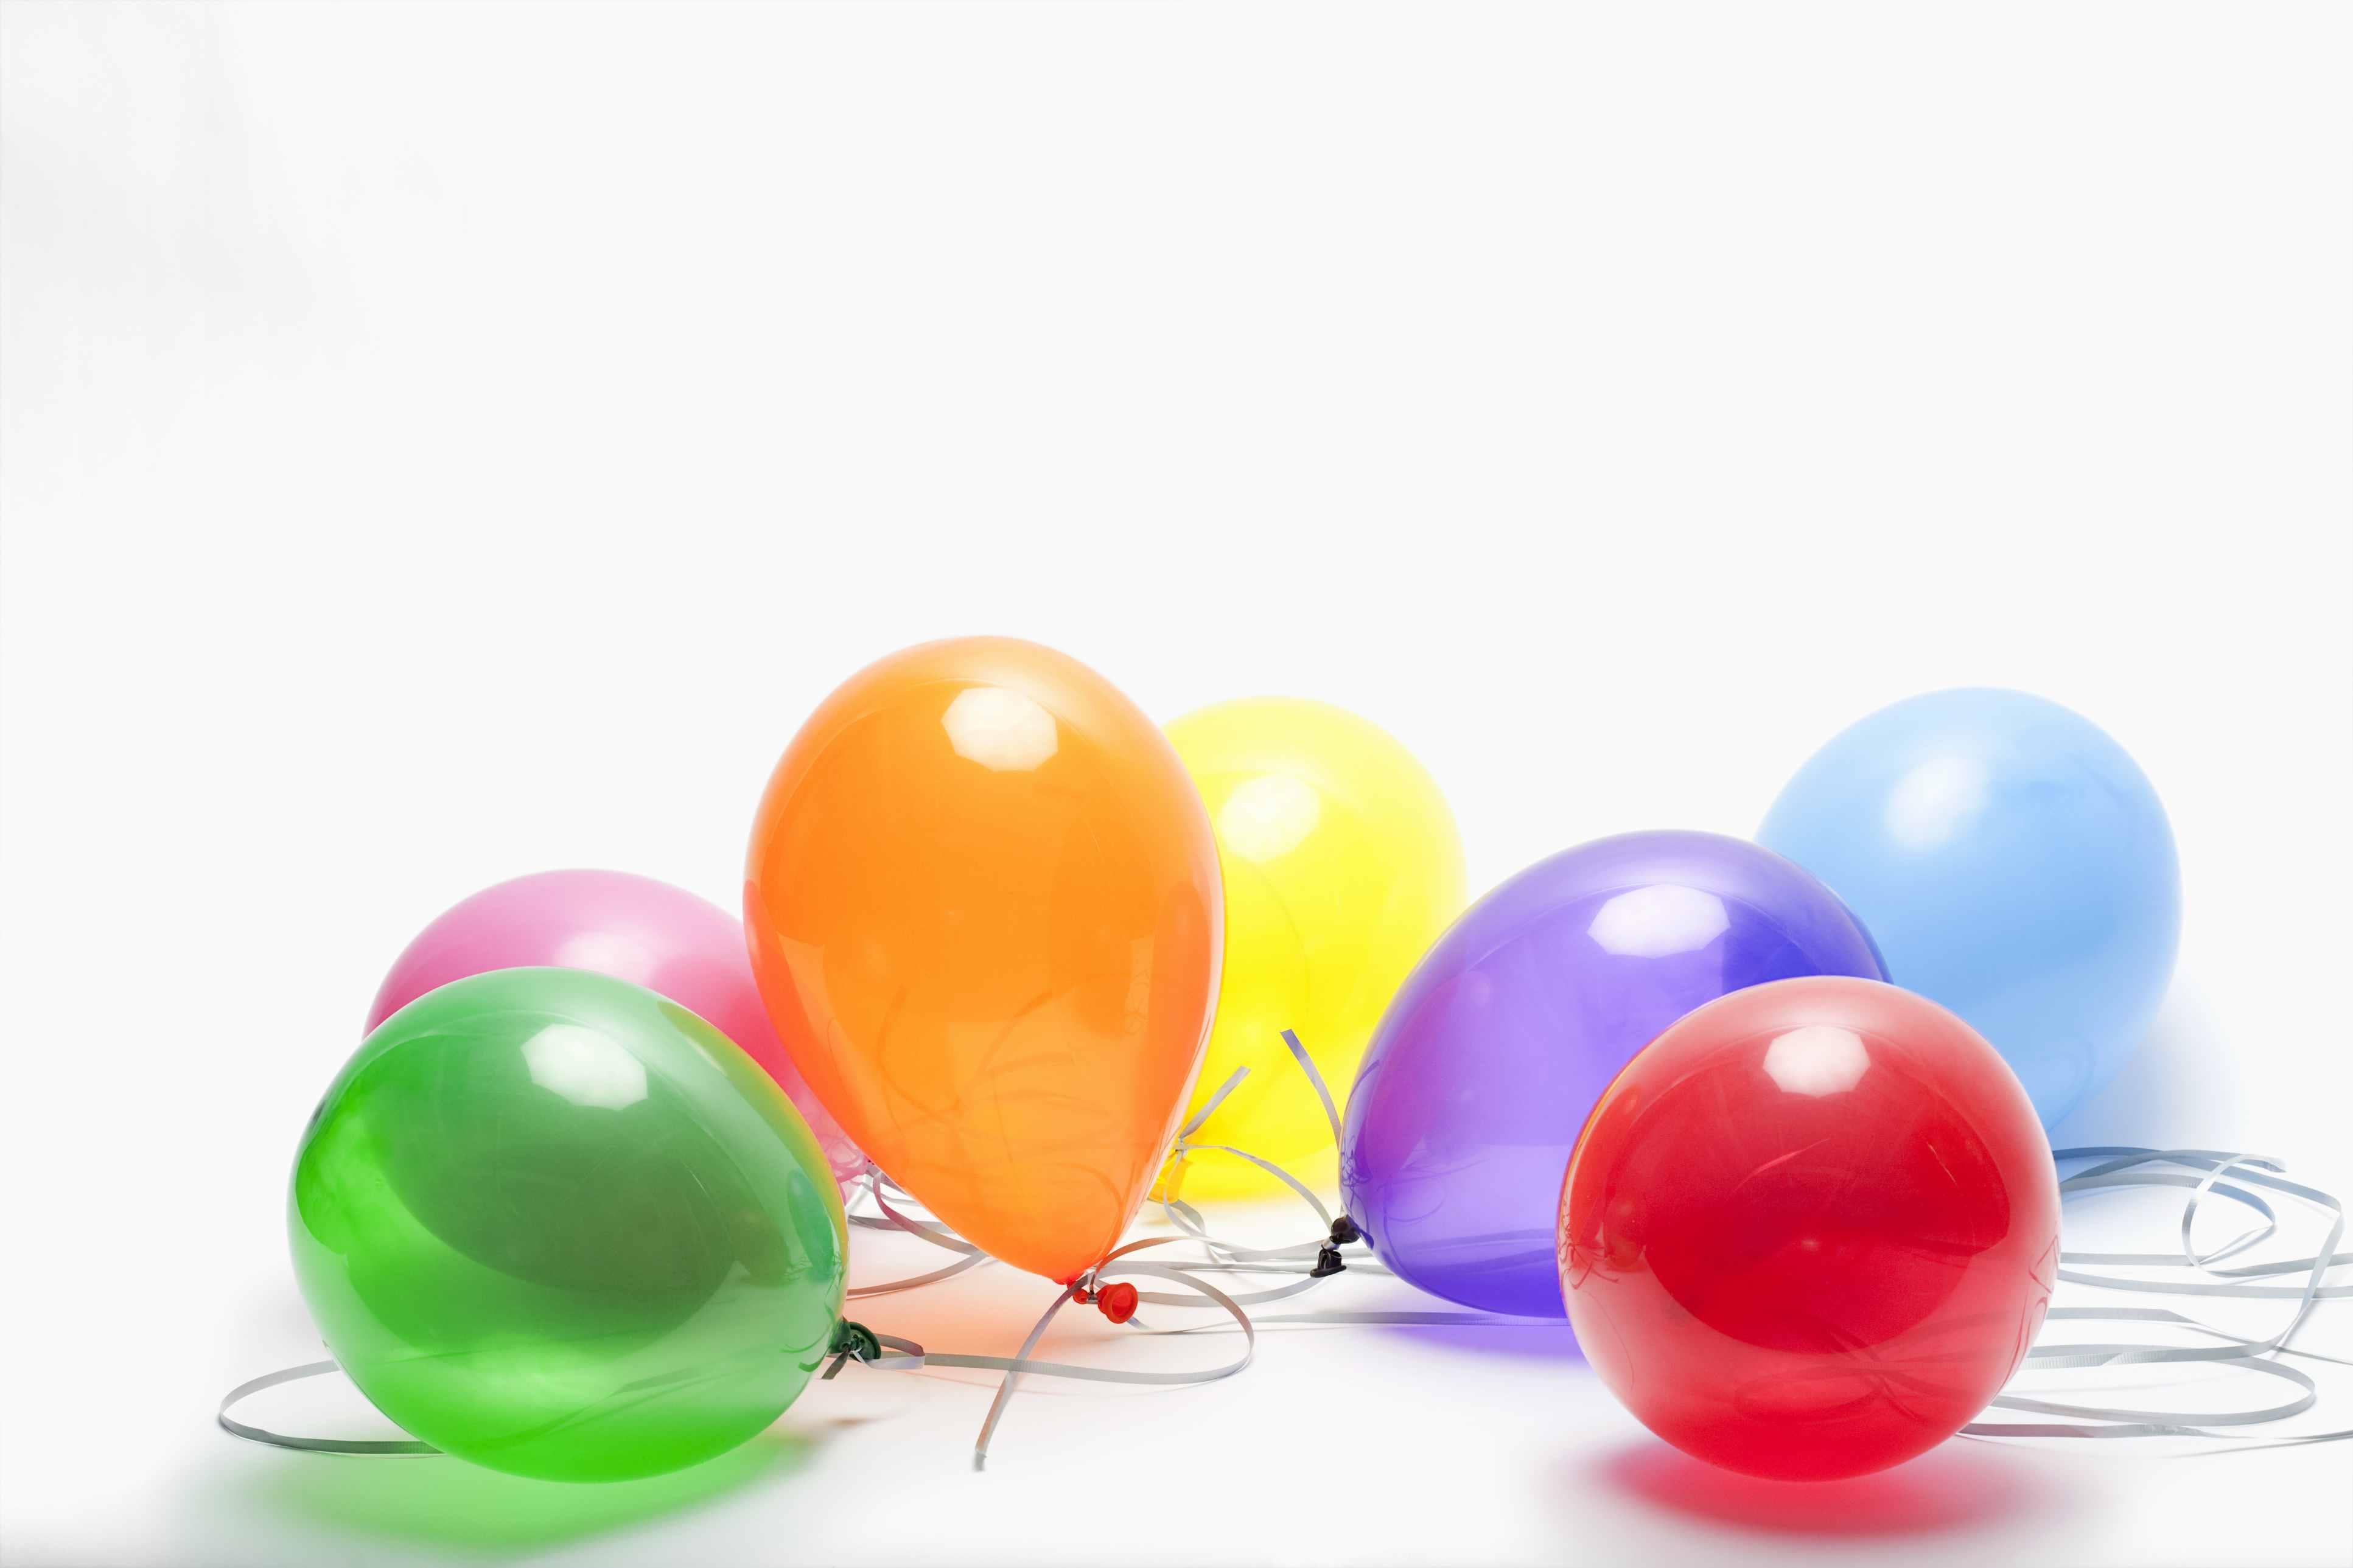 Random colored balloons